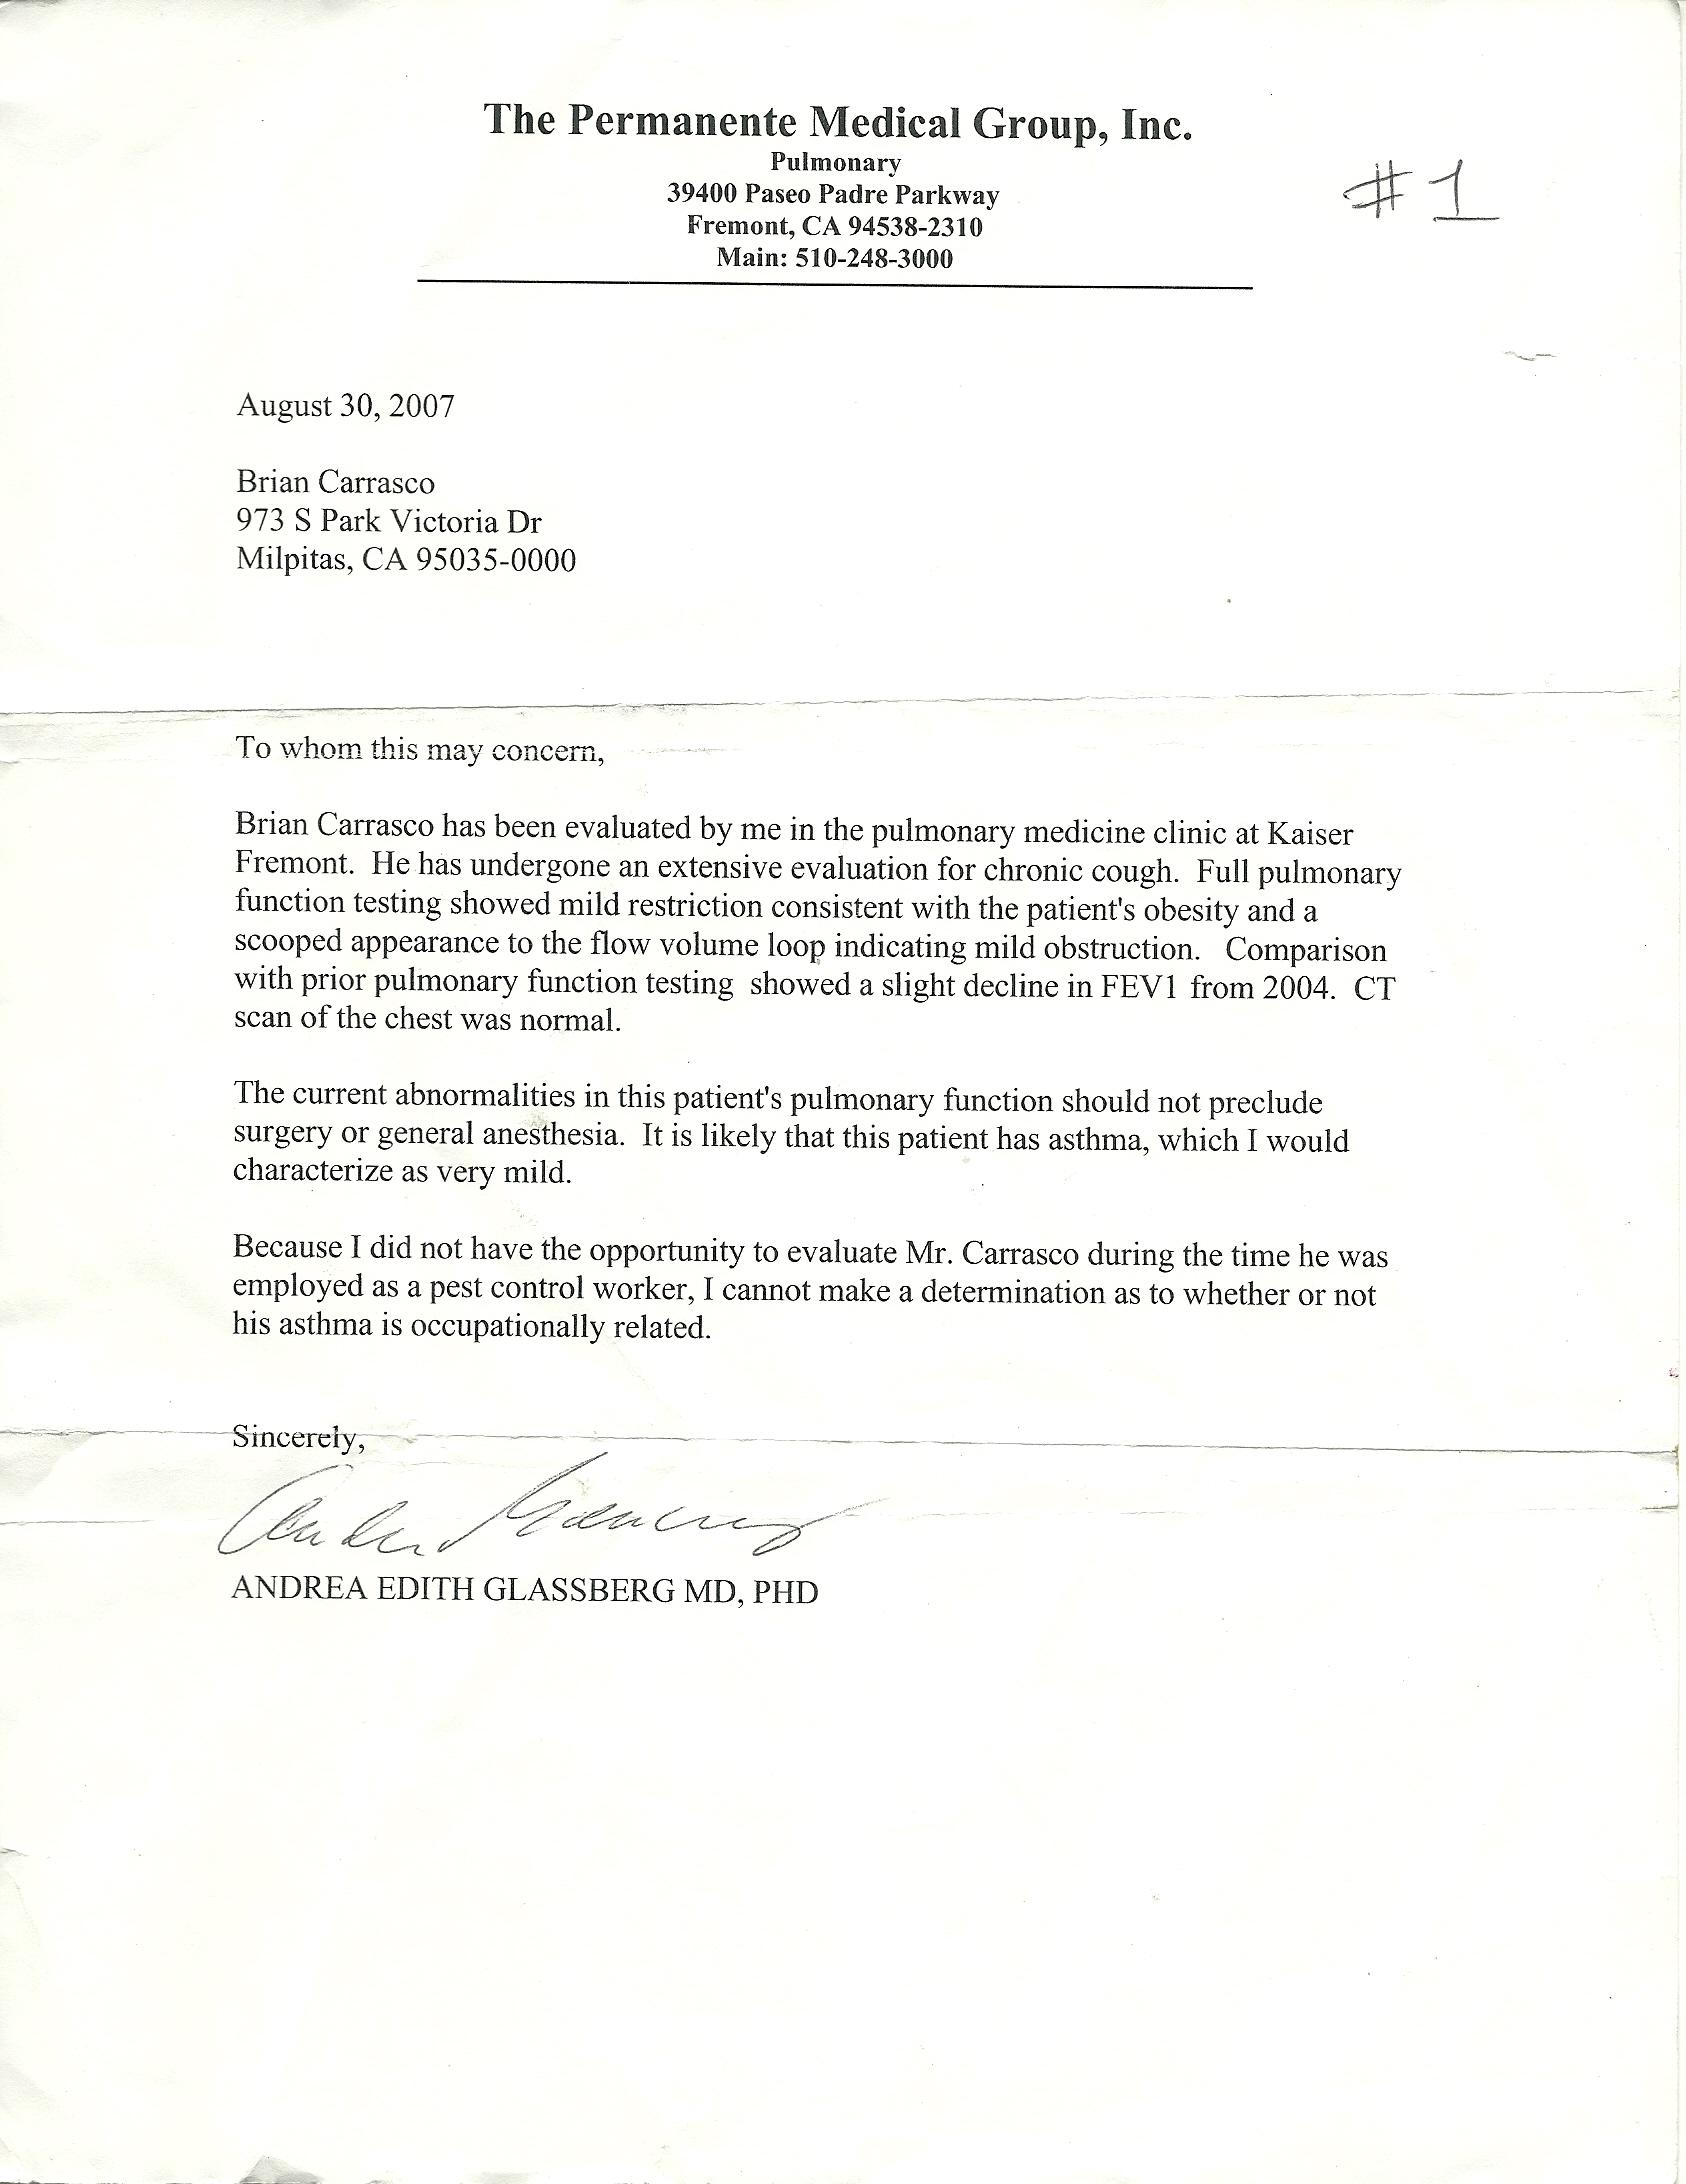 Kaiser Permanente Doctors Note Resume Examples Resume